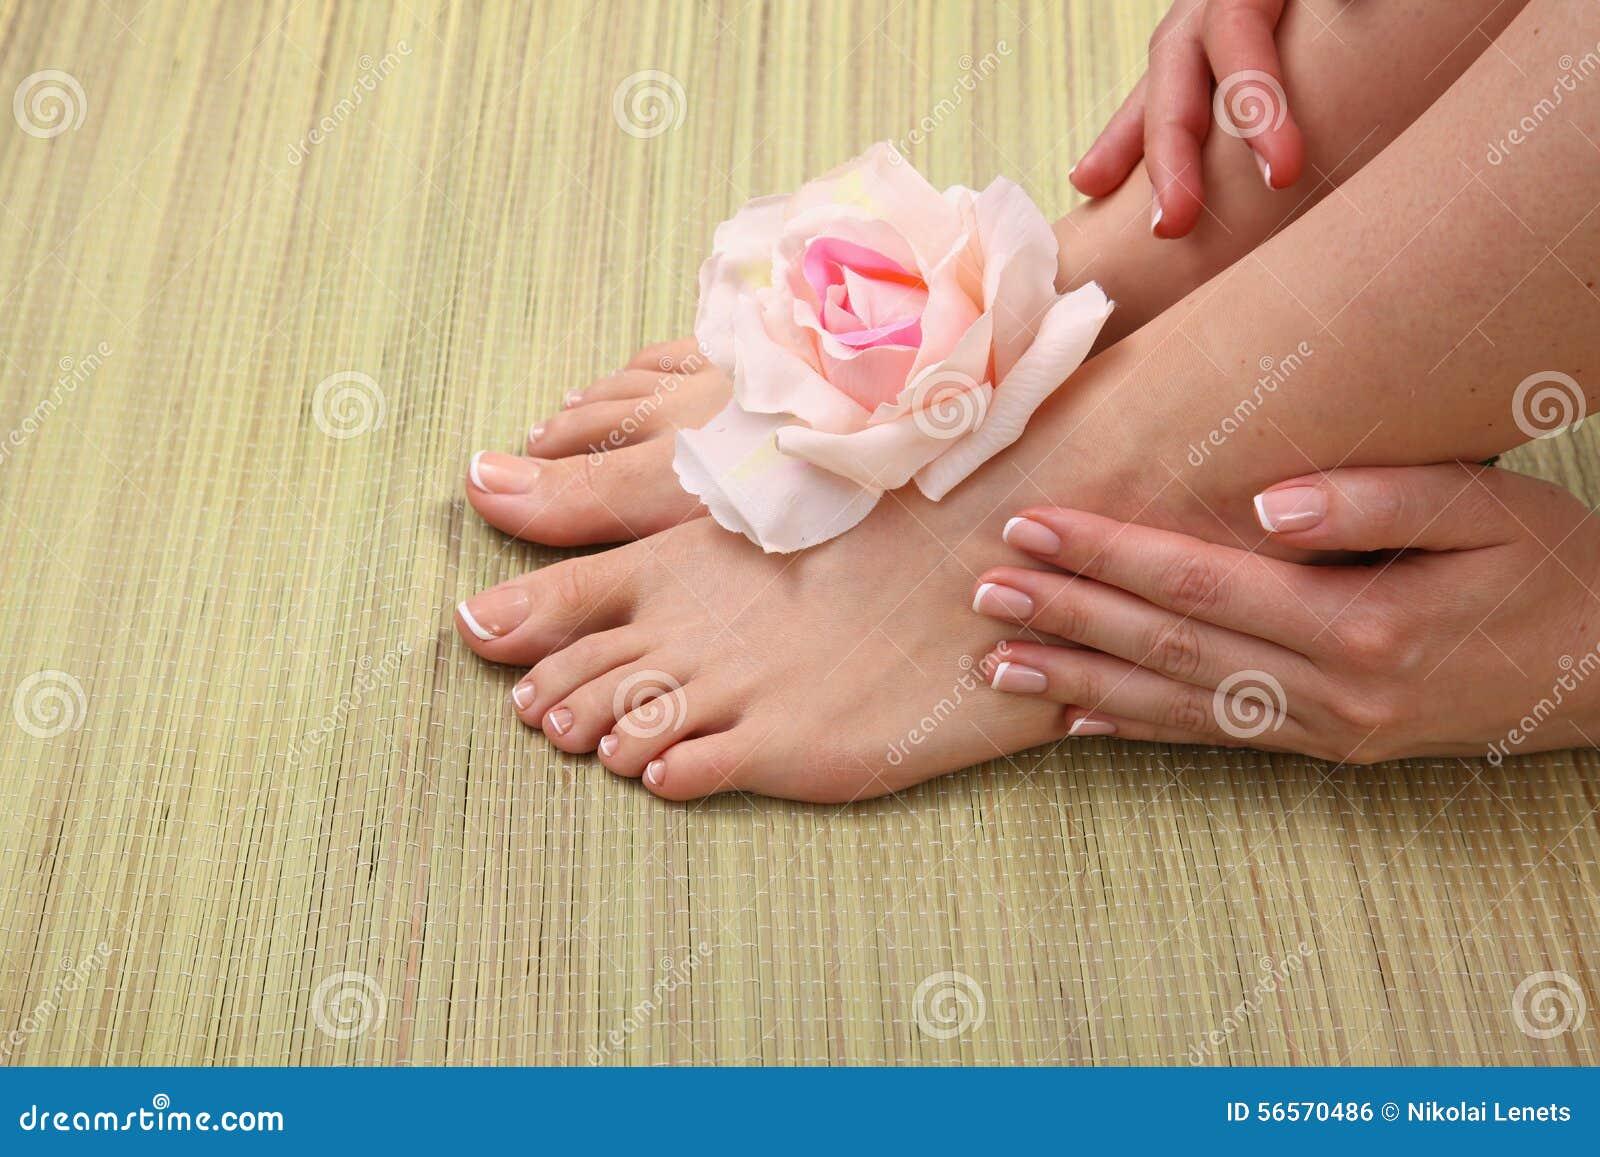 Download Όμορφα πόδια με το τέλειο γαλλικό καρφί SPA Στοκ Εικόνες - εικόνα από δάχτυλο, πόδι: 56570486